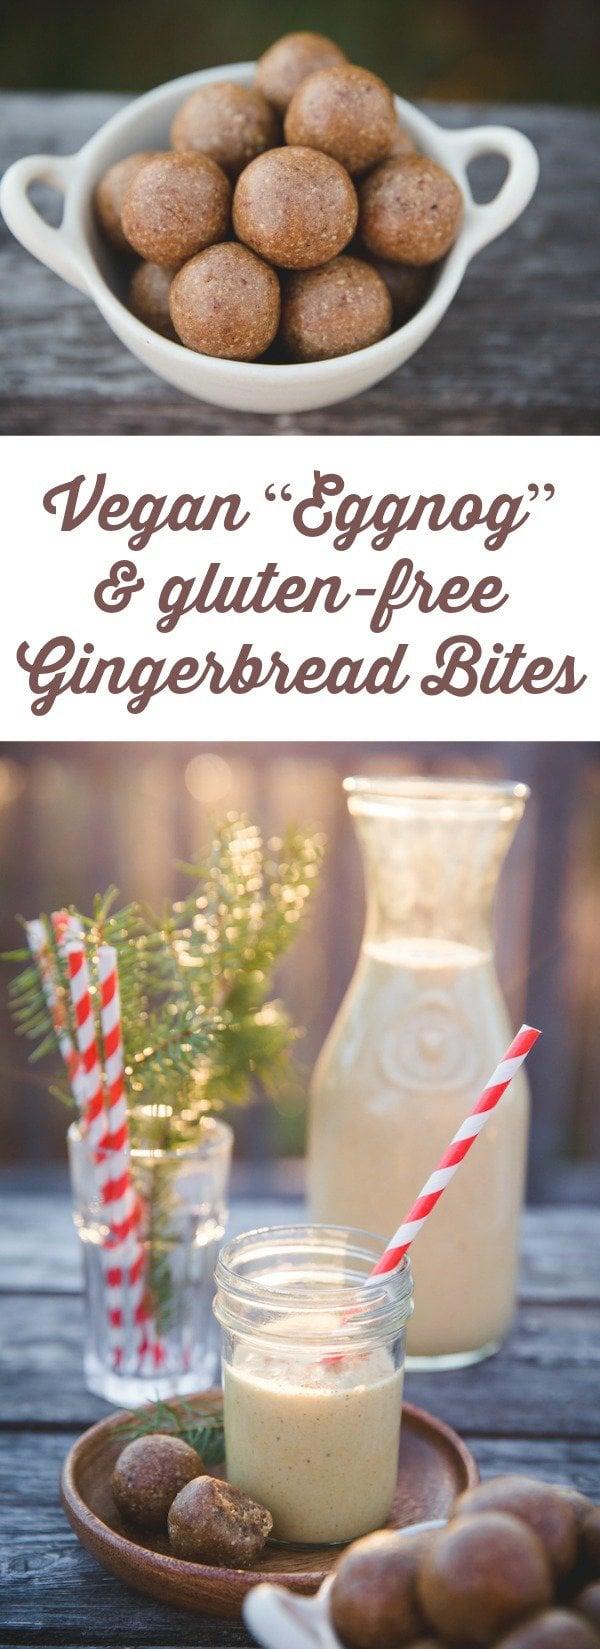 "Raw, Vegan ""Eggnog"" & Gluten-Free Gingerbread Bites"